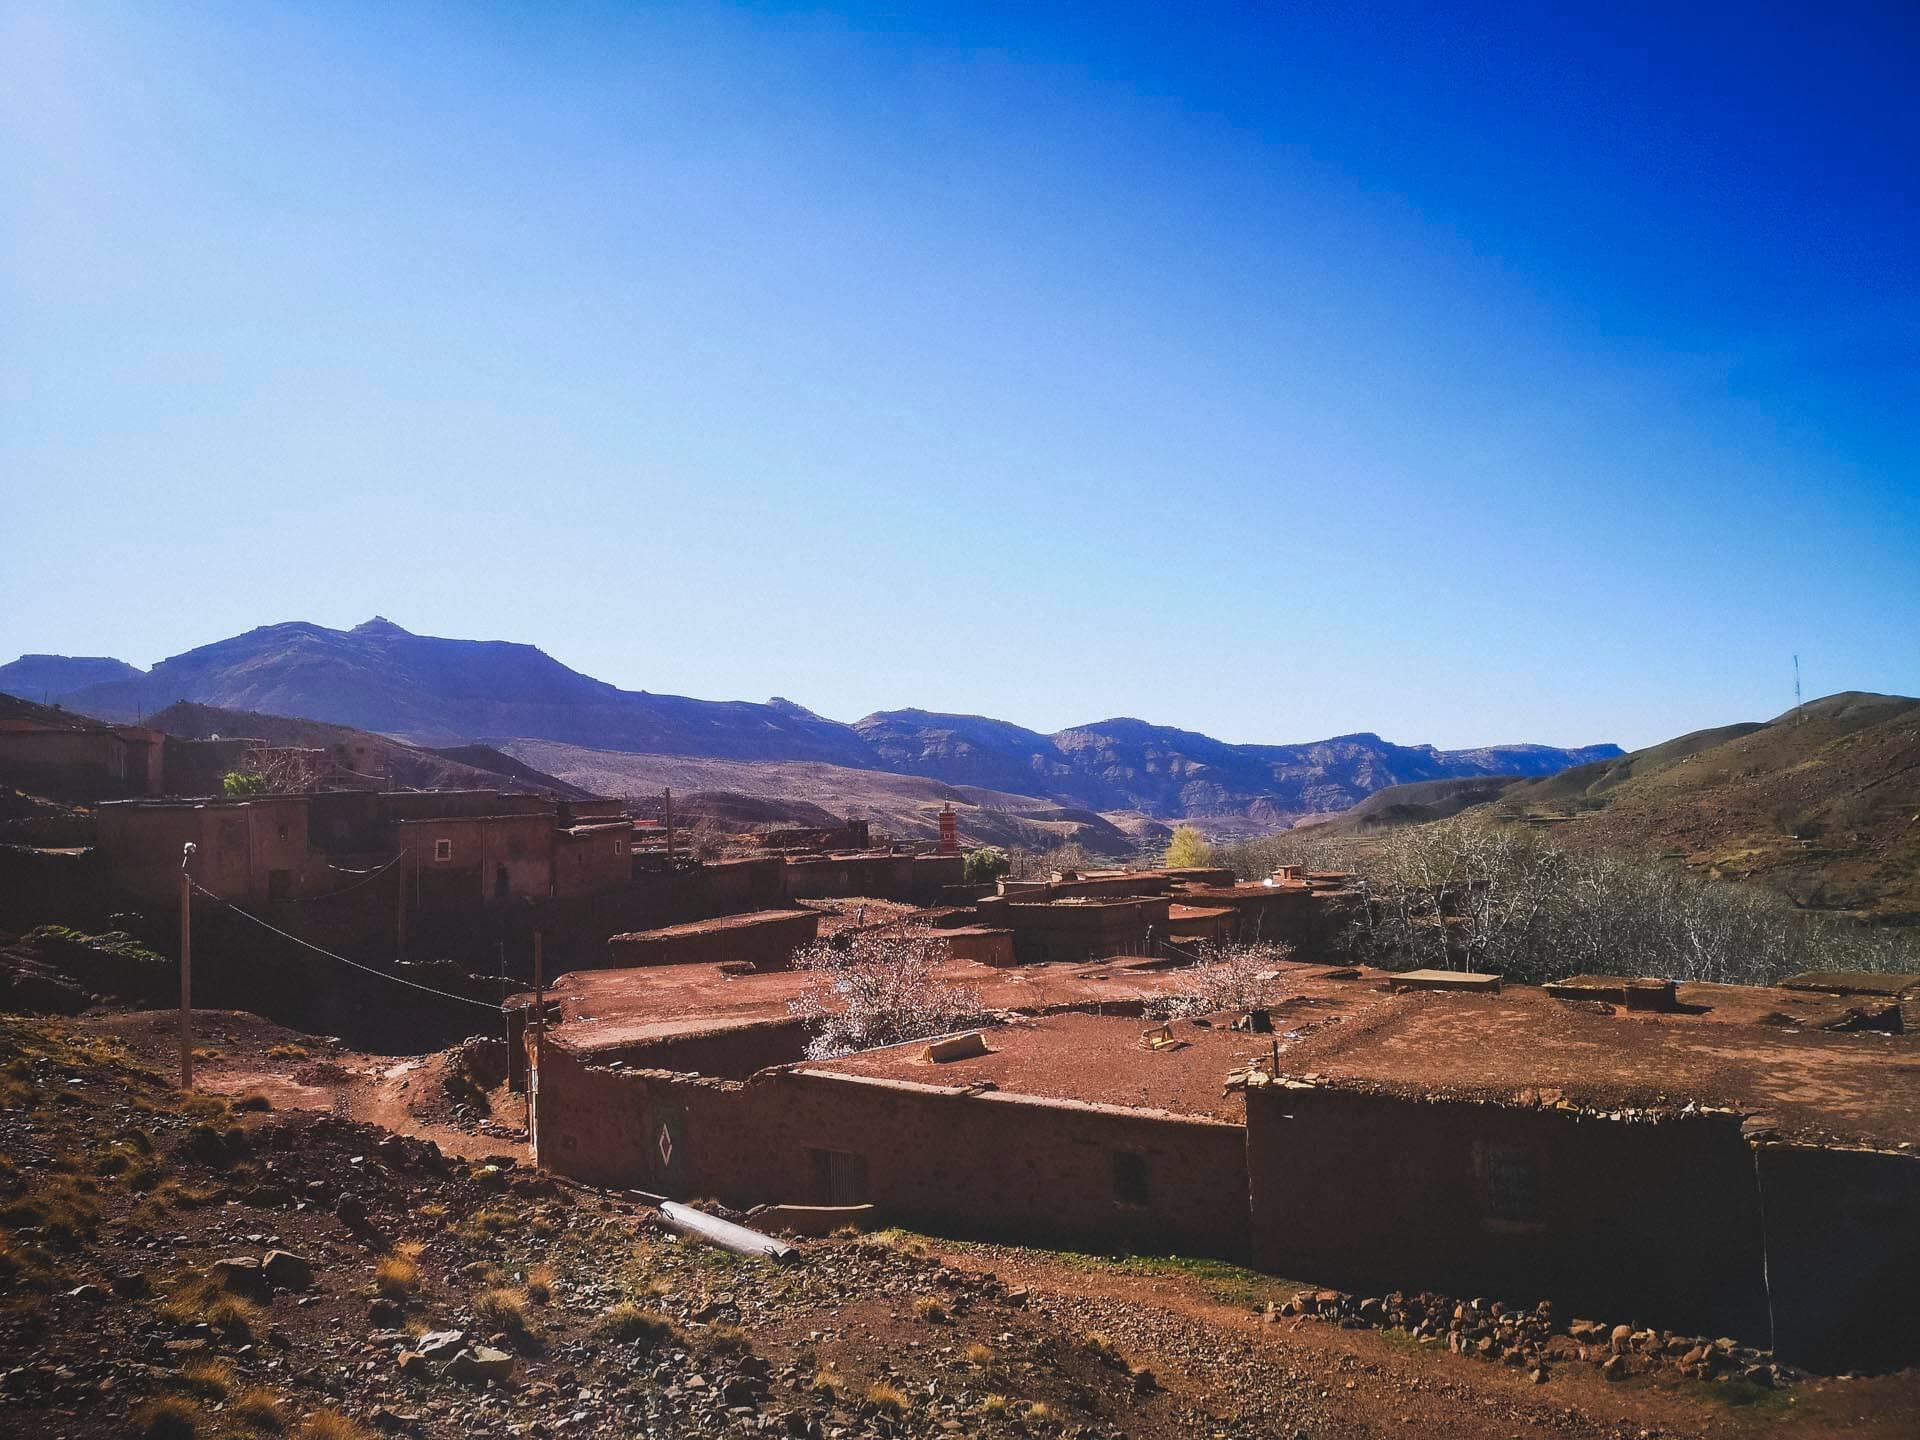 marocco-104141